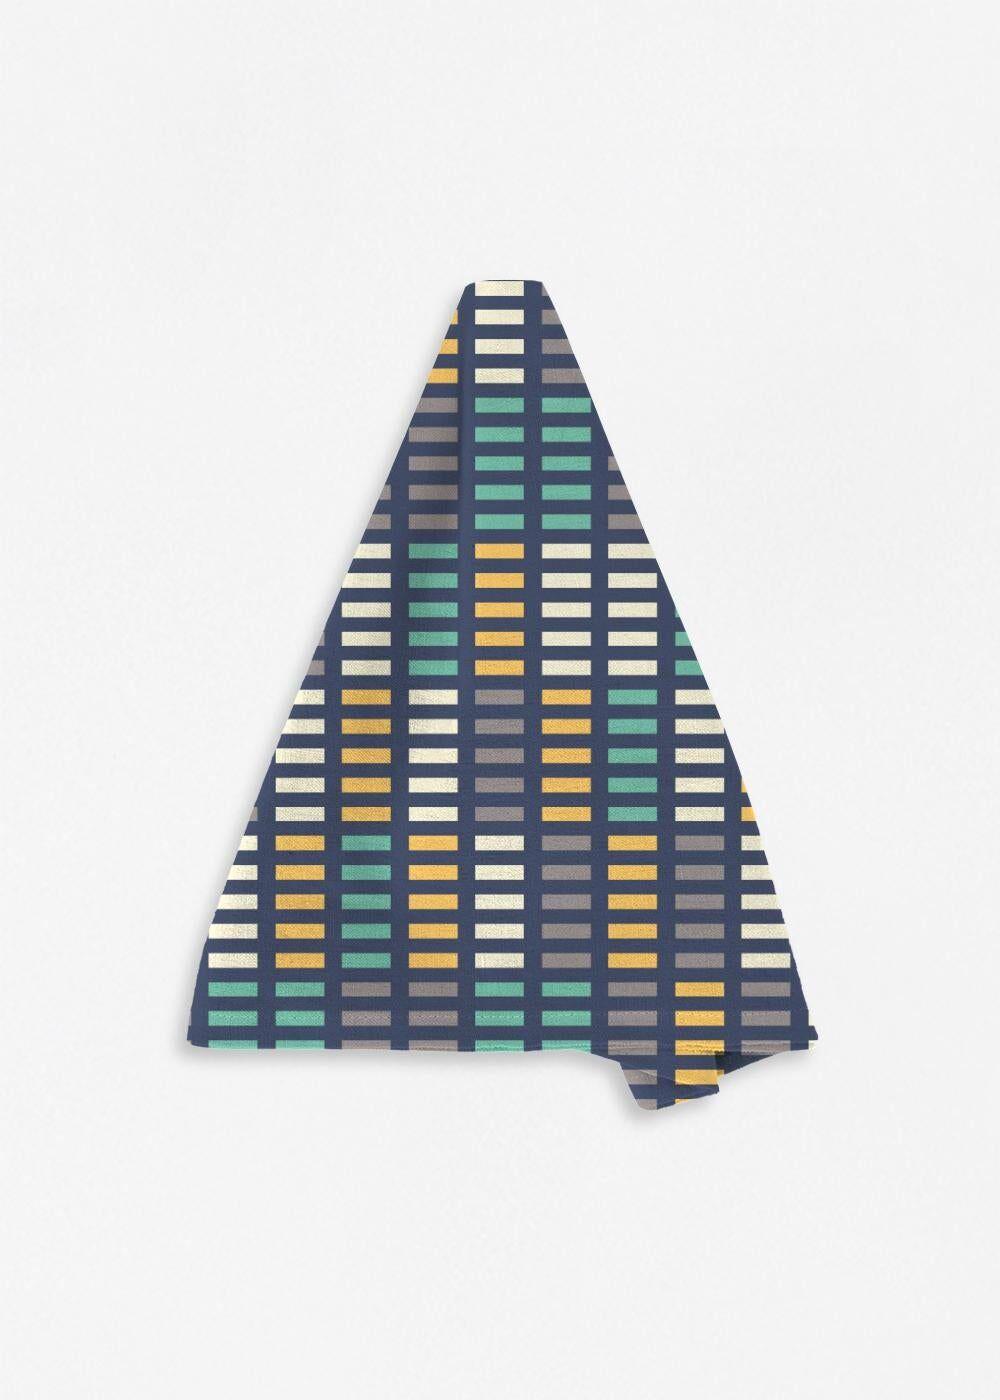 VIDA Napkin Set - Music Equalizer by VIDA Original Artist  - Size: Set of 4